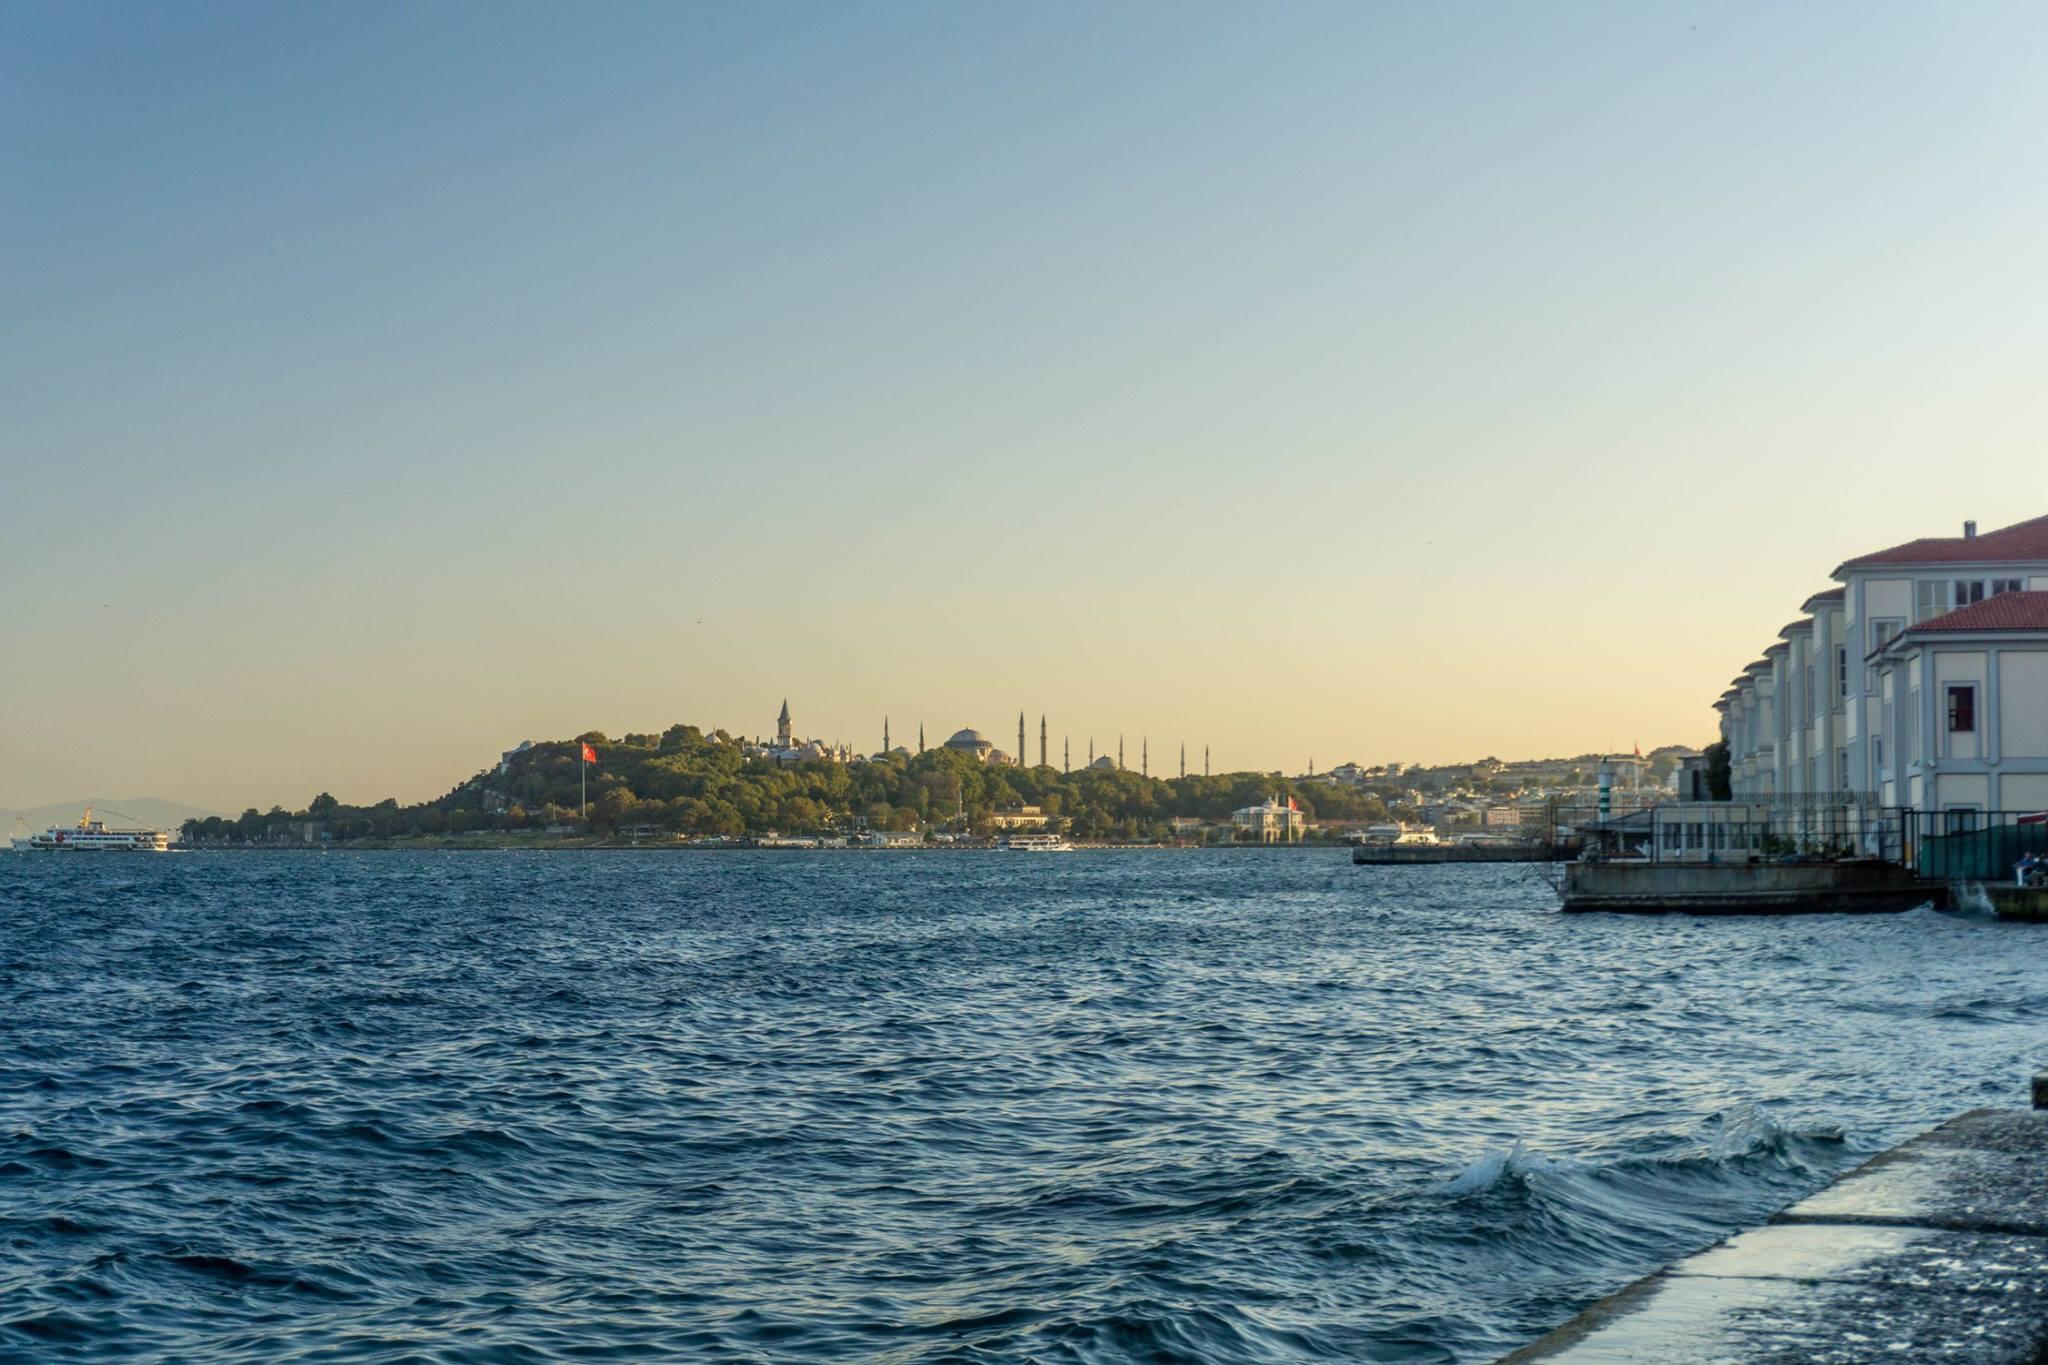 Istanbul, Historic Peninsula from TophaneIstanbul, Historic Peninsula from Tophane